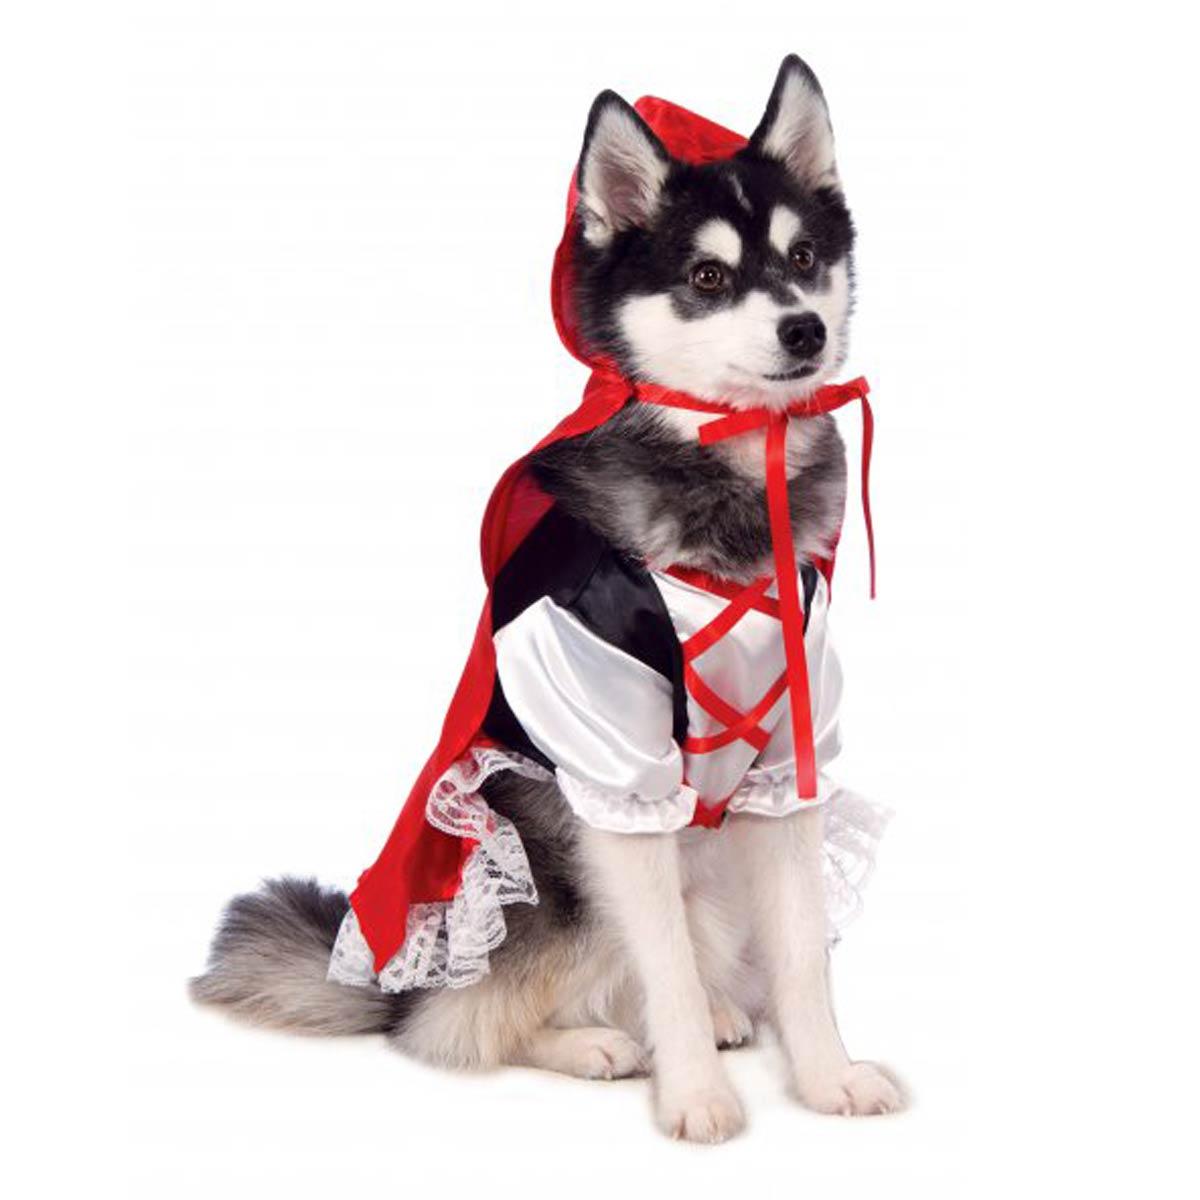 Rubieu0027s Red Riding Hood Dog Costume  sc 1 st  BaxterBoo & Rubieu0027s Red Riding Hood Dog Costume with Same Day Shipping | BaxterBoo